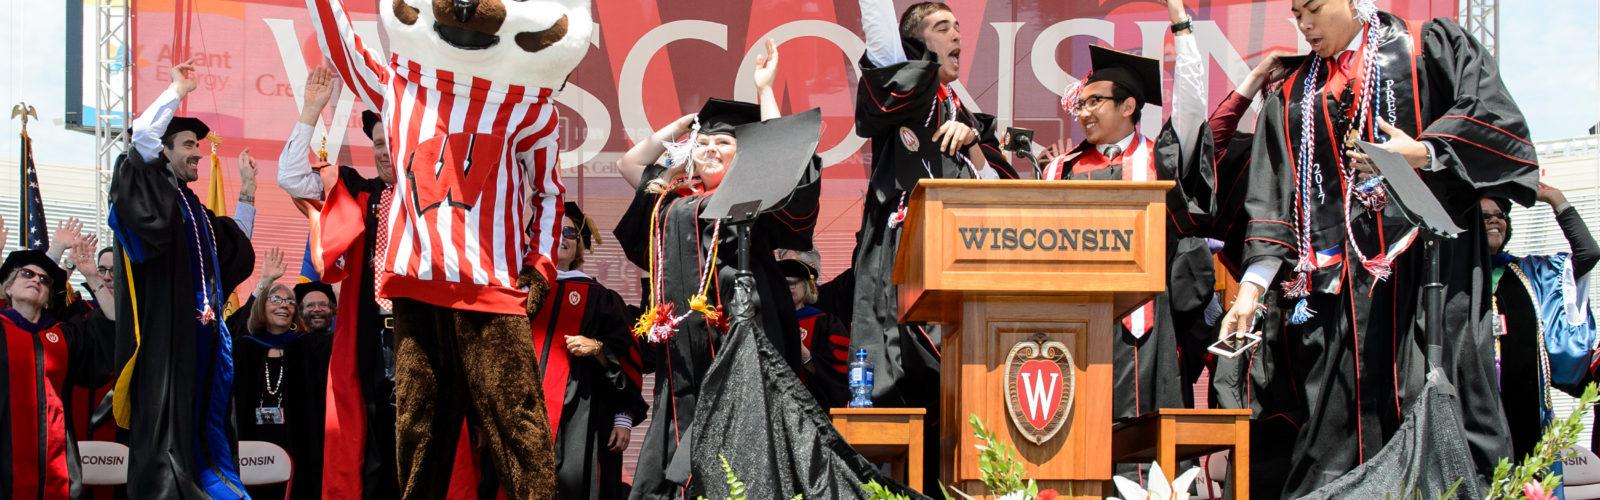 Students celebrating graduation.